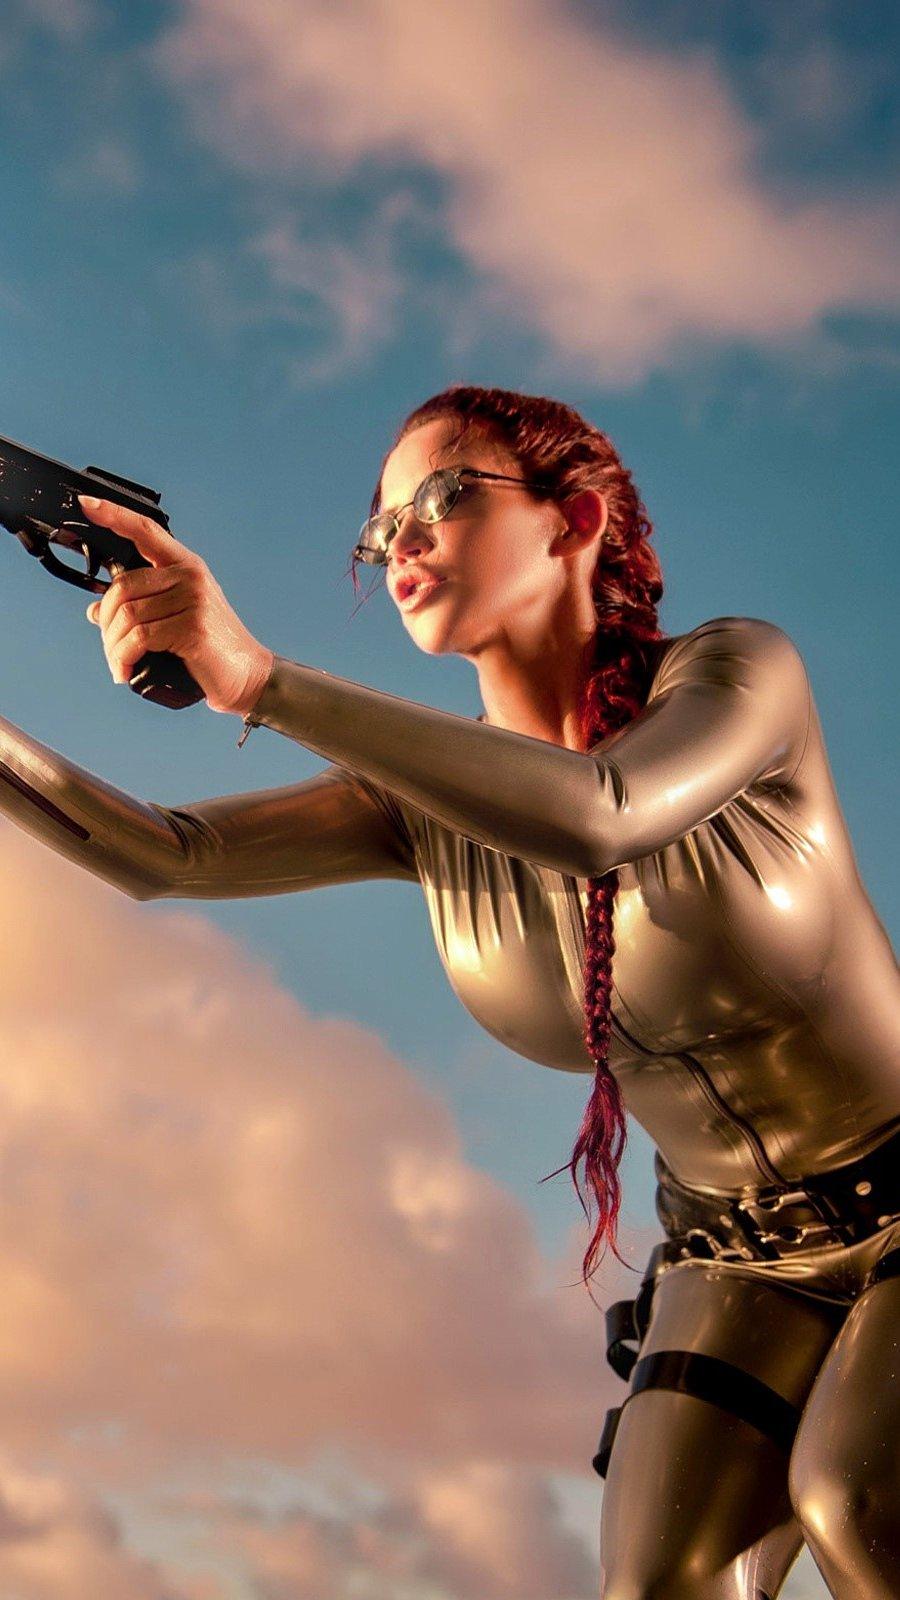 Fondos de pantalla Lara Croft con pistolas Vertical